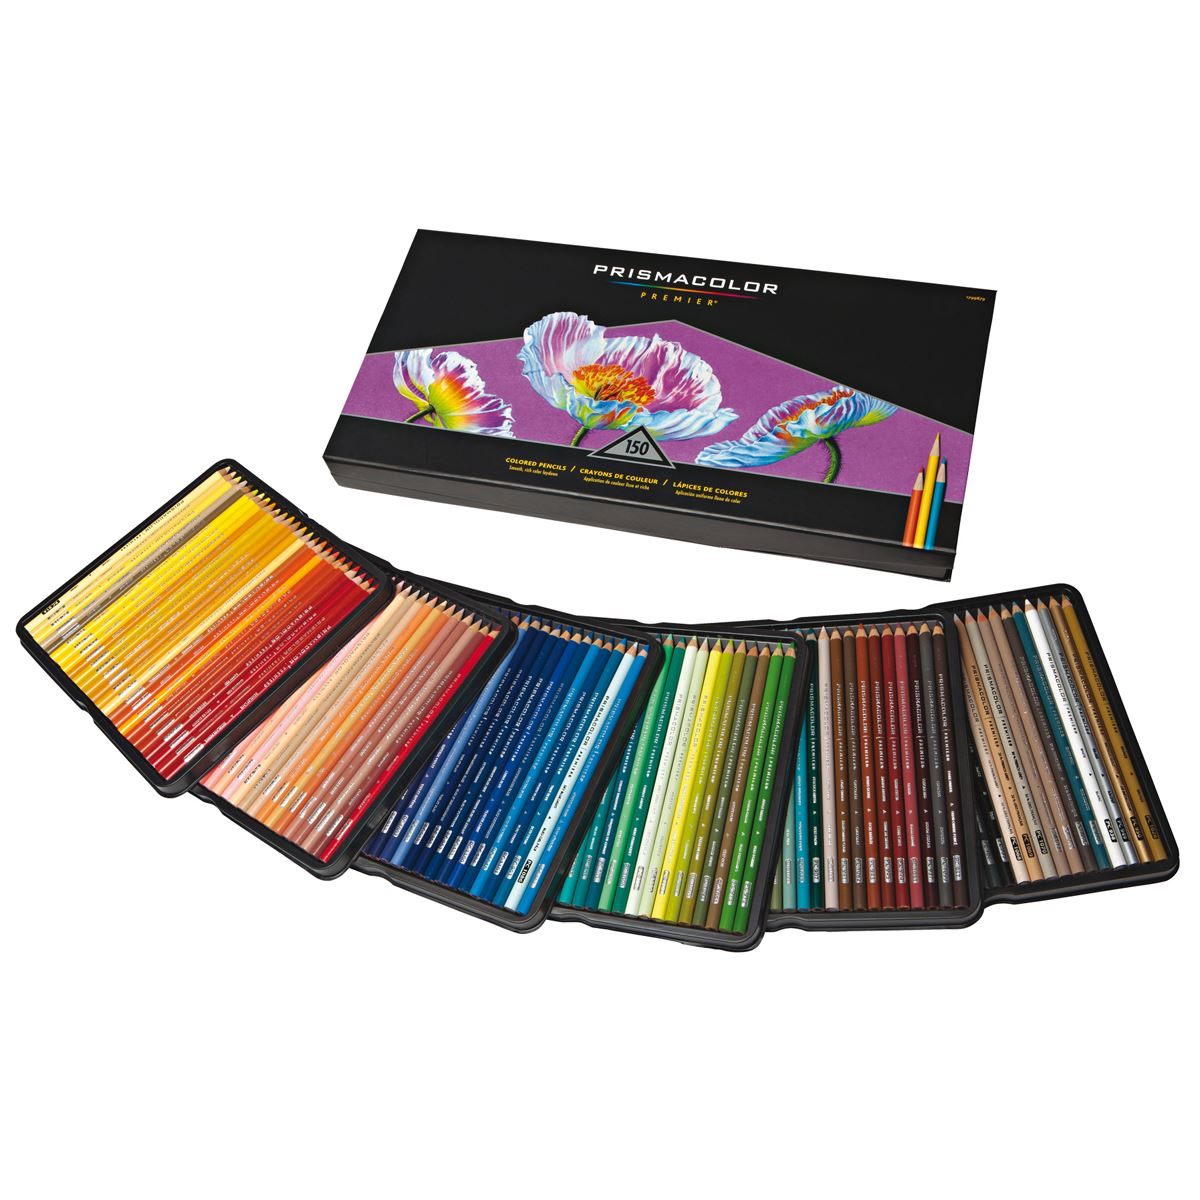 Prismacolor Premier 150 piezas